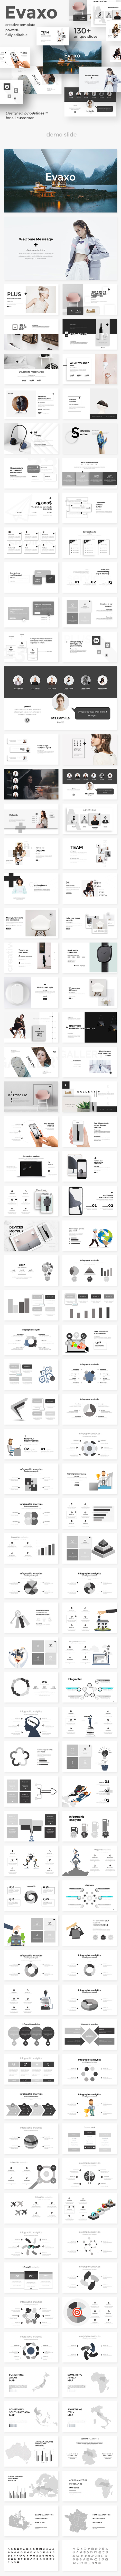 Evaxo Creative Google Slide Template - Google Slides Presentation Templates